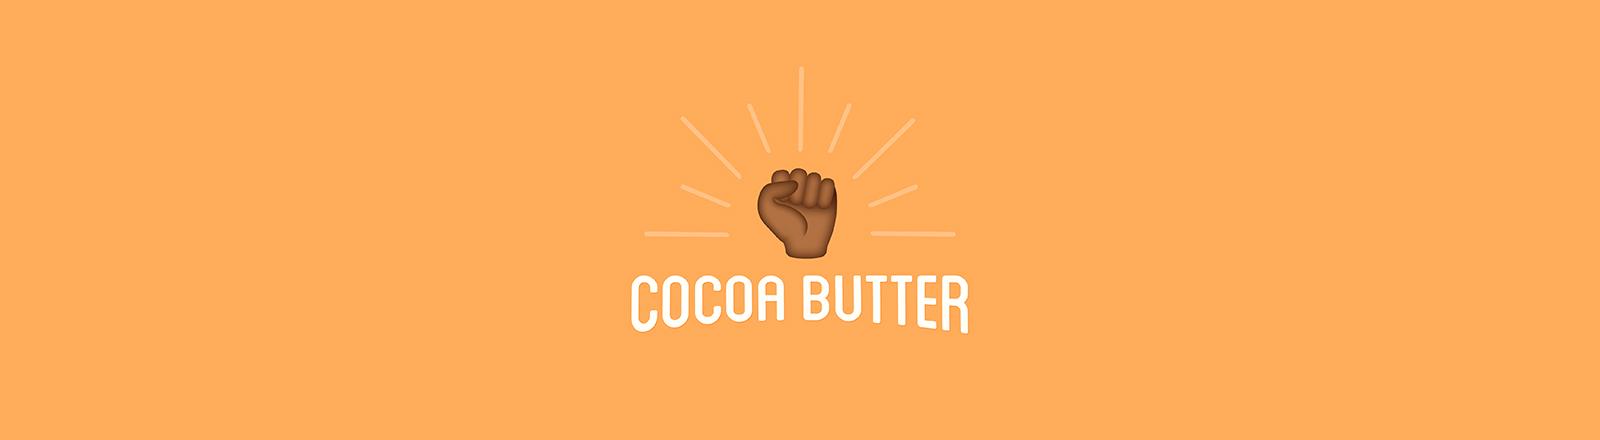 cocoa_butter-eye